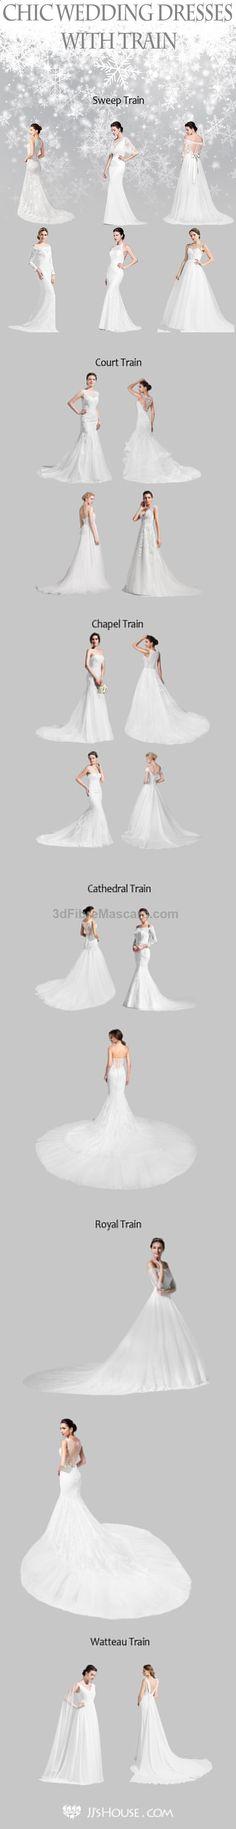 CHIC Wedding Dresses With TRAIN! CHOOSE ONE NOW! #weddingdress